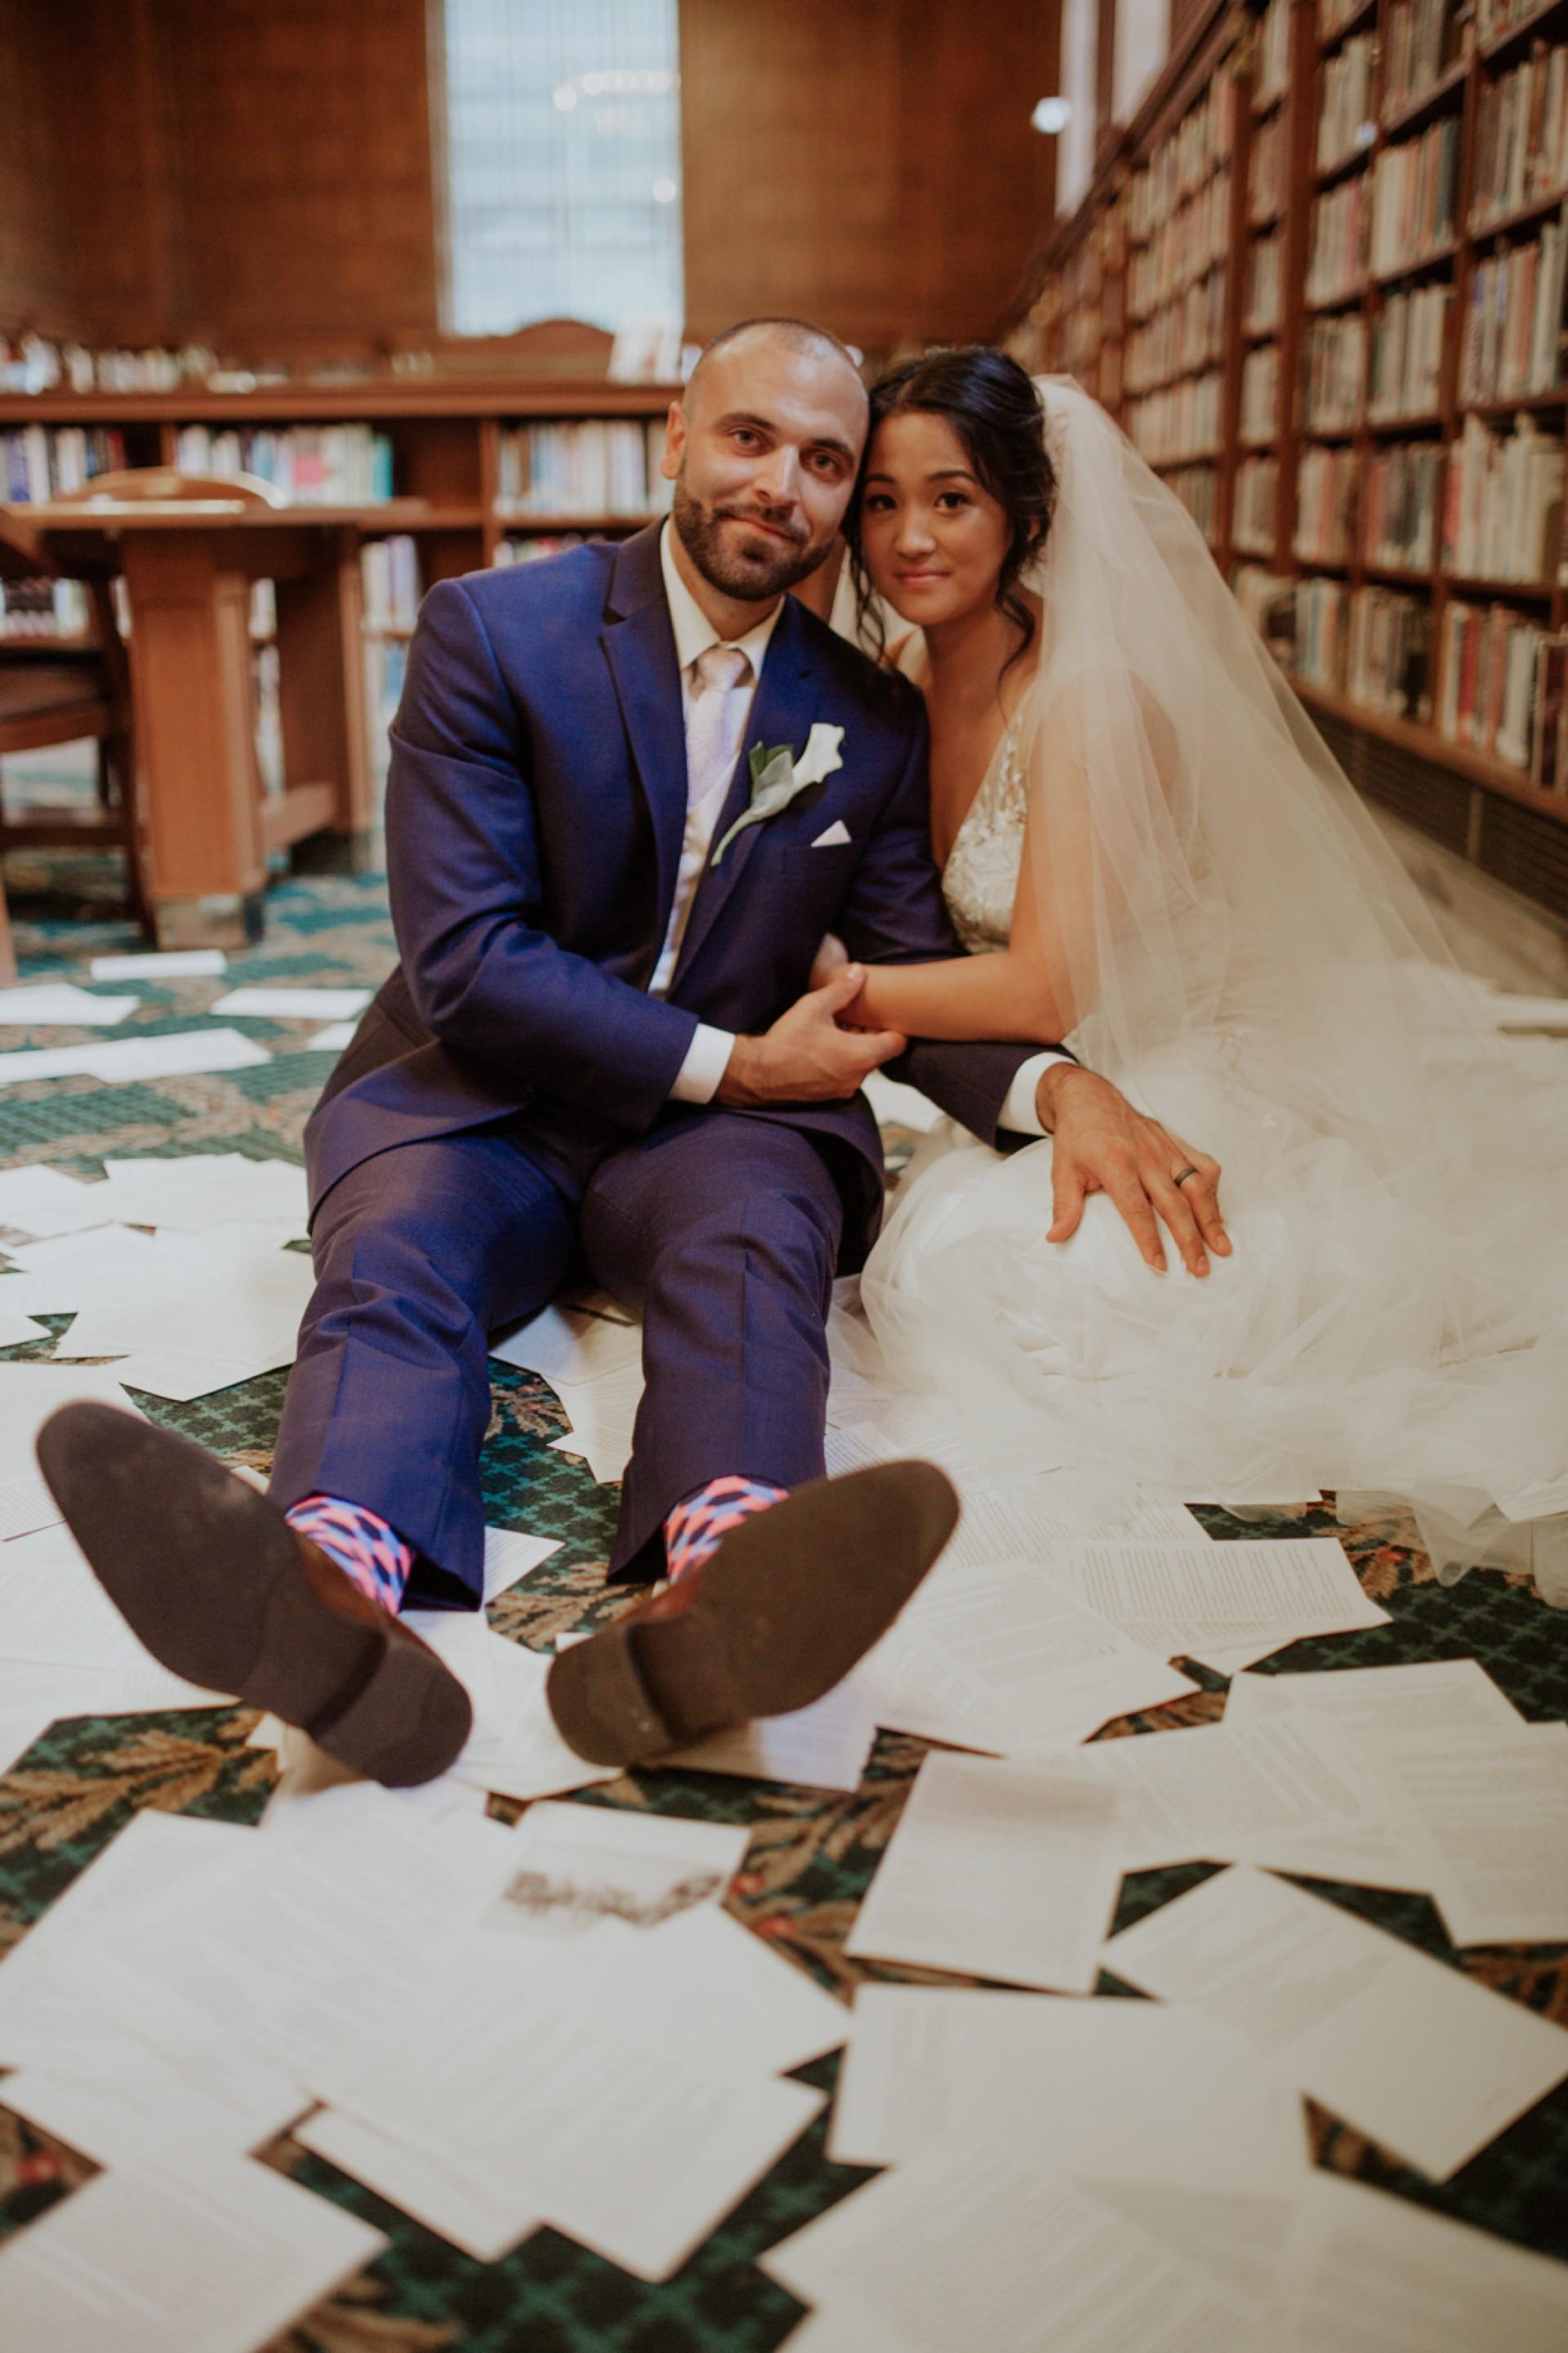 Indianapolis-Public-Library-Wedding_074.jpg